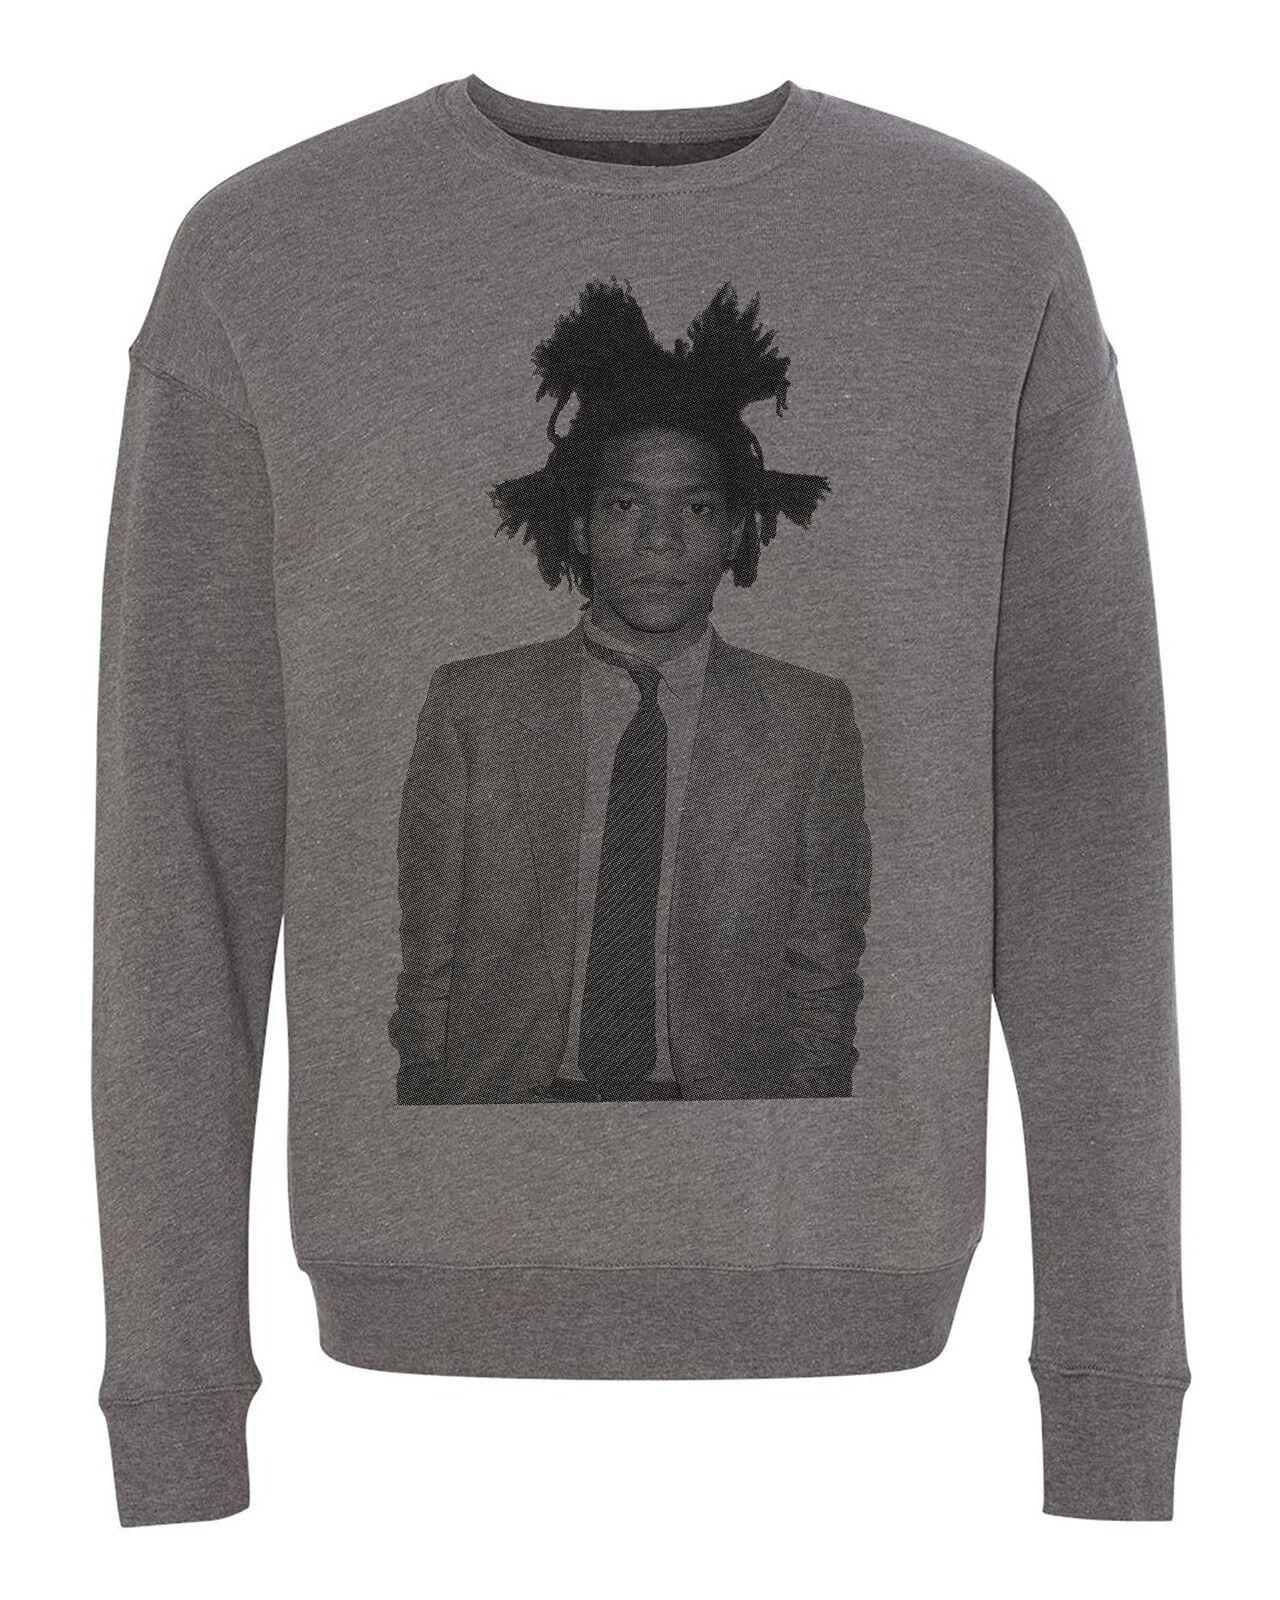 Jean Michel Basquiat Art Graffiti Designer Fashion Unisex Pullover Sweatshirt